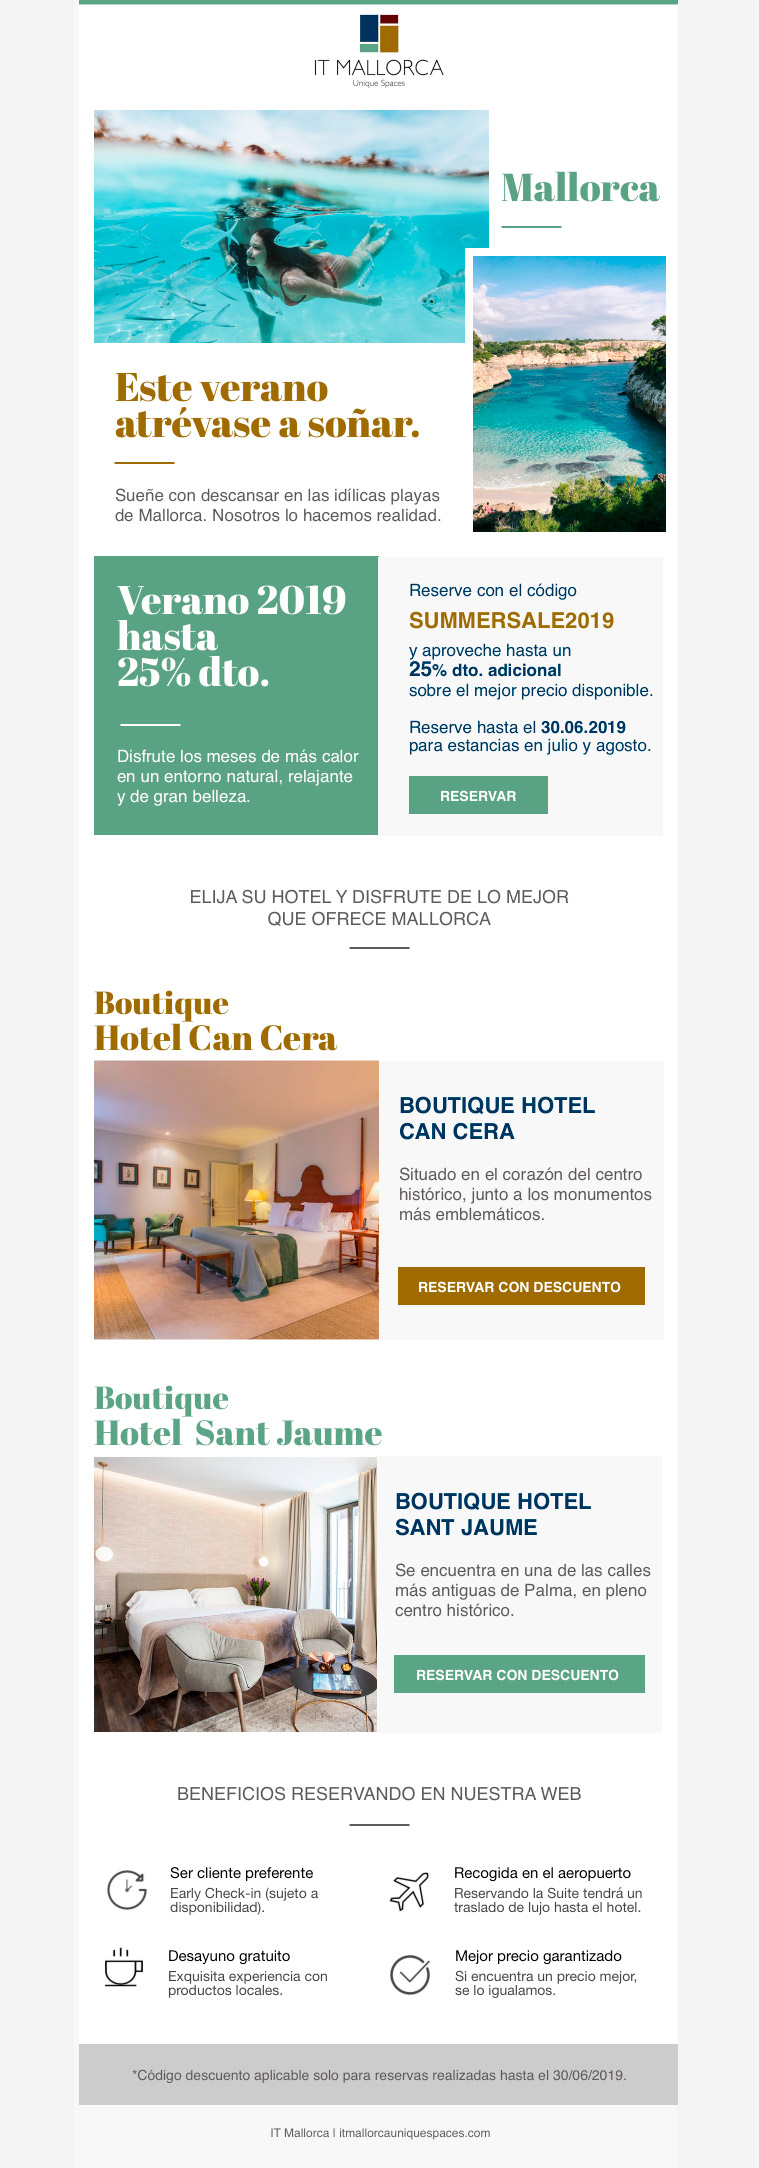 ItMallorca_hotels_05